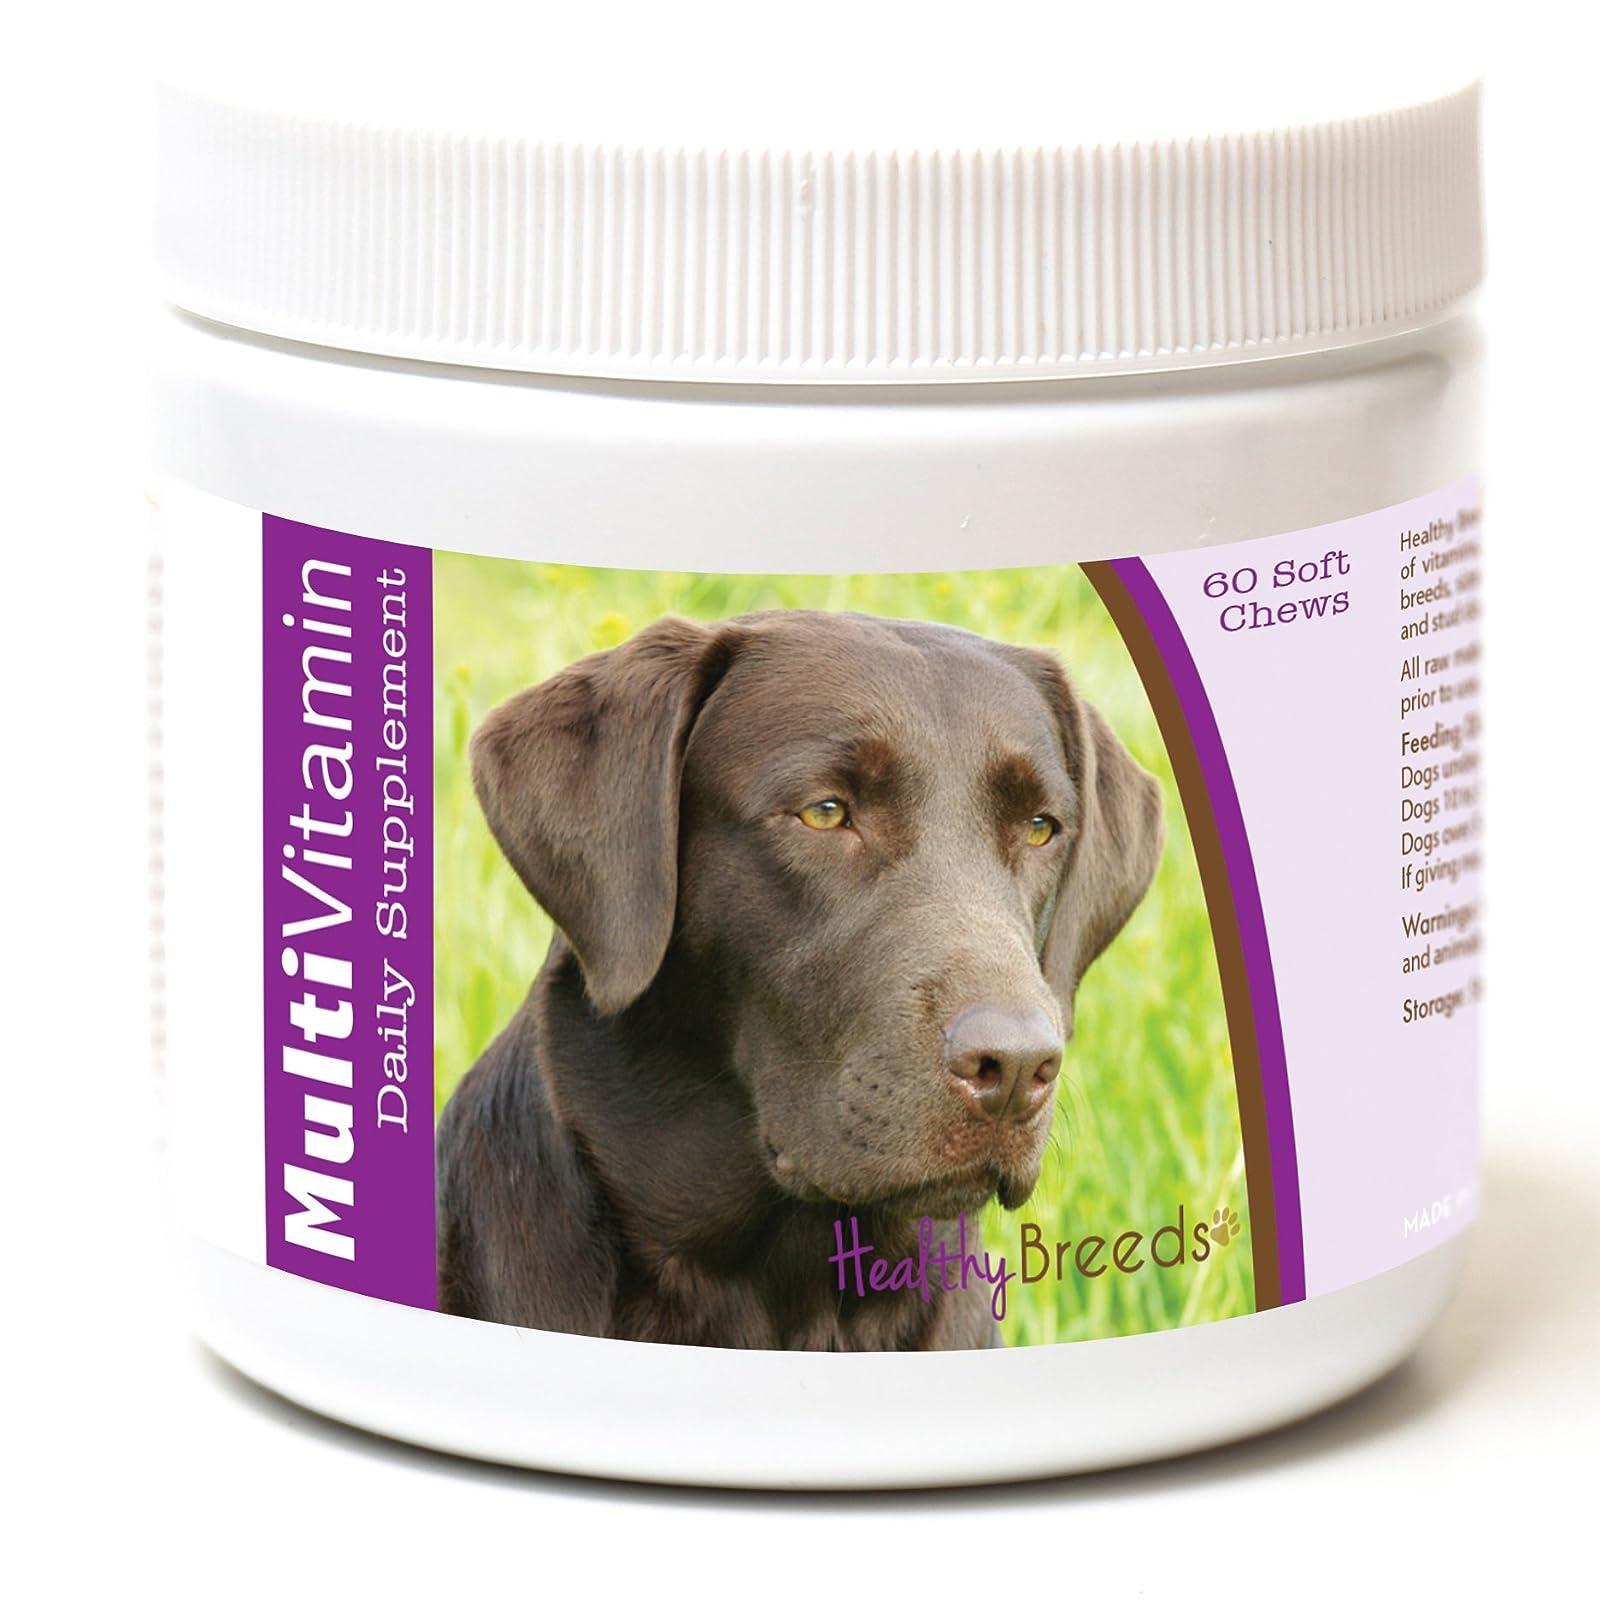 Healthy Breeds Dog One A Day Vitamin Labrador Retriever, Dark Brown - 1